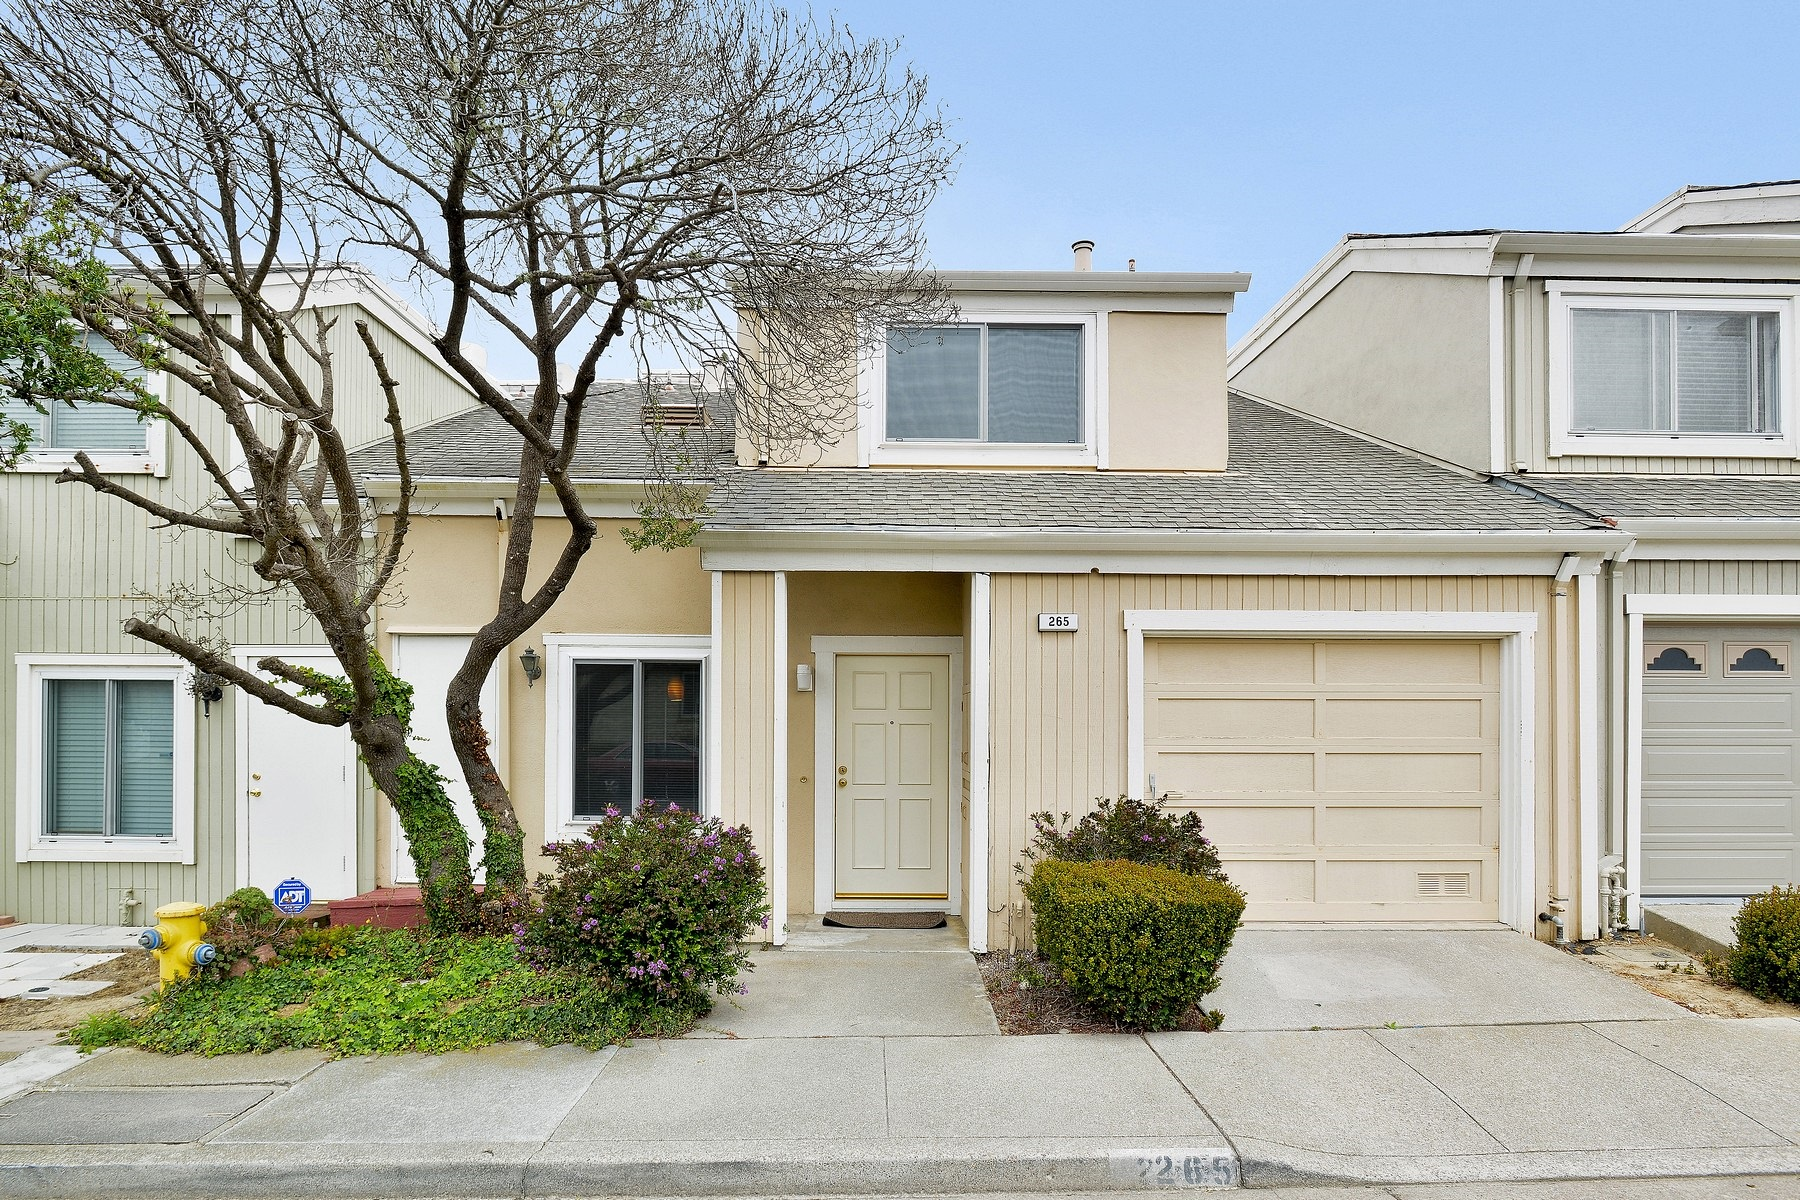 265 Serravista Ave, Daly City, CA 94015